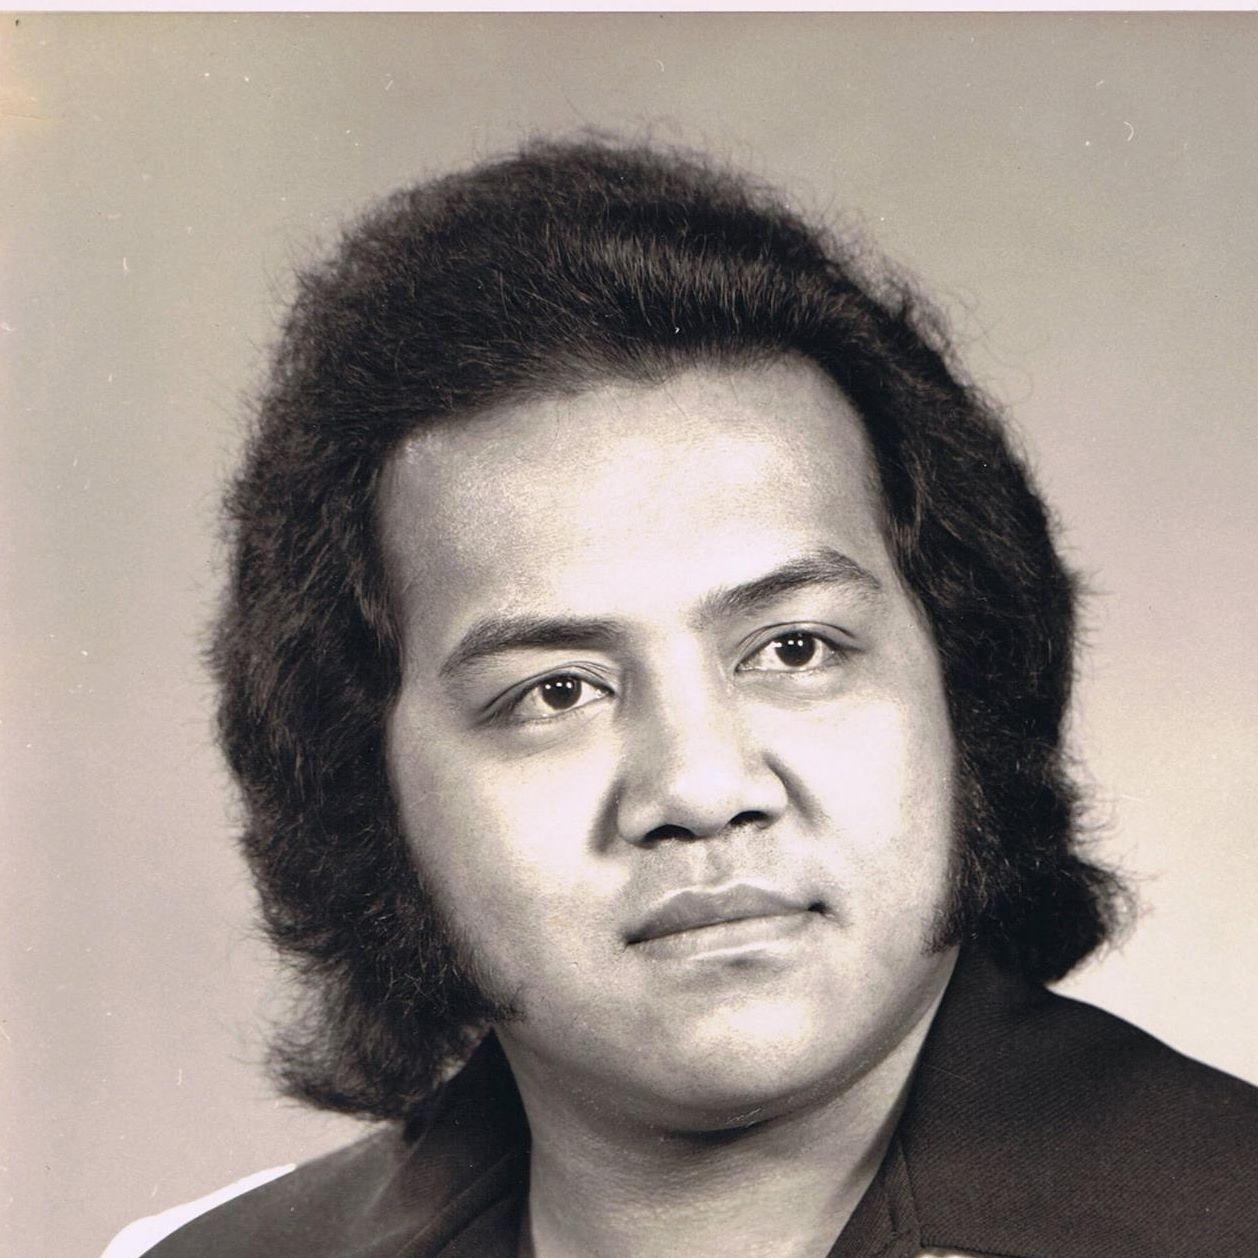 Black and white image of Pulefano Galeai